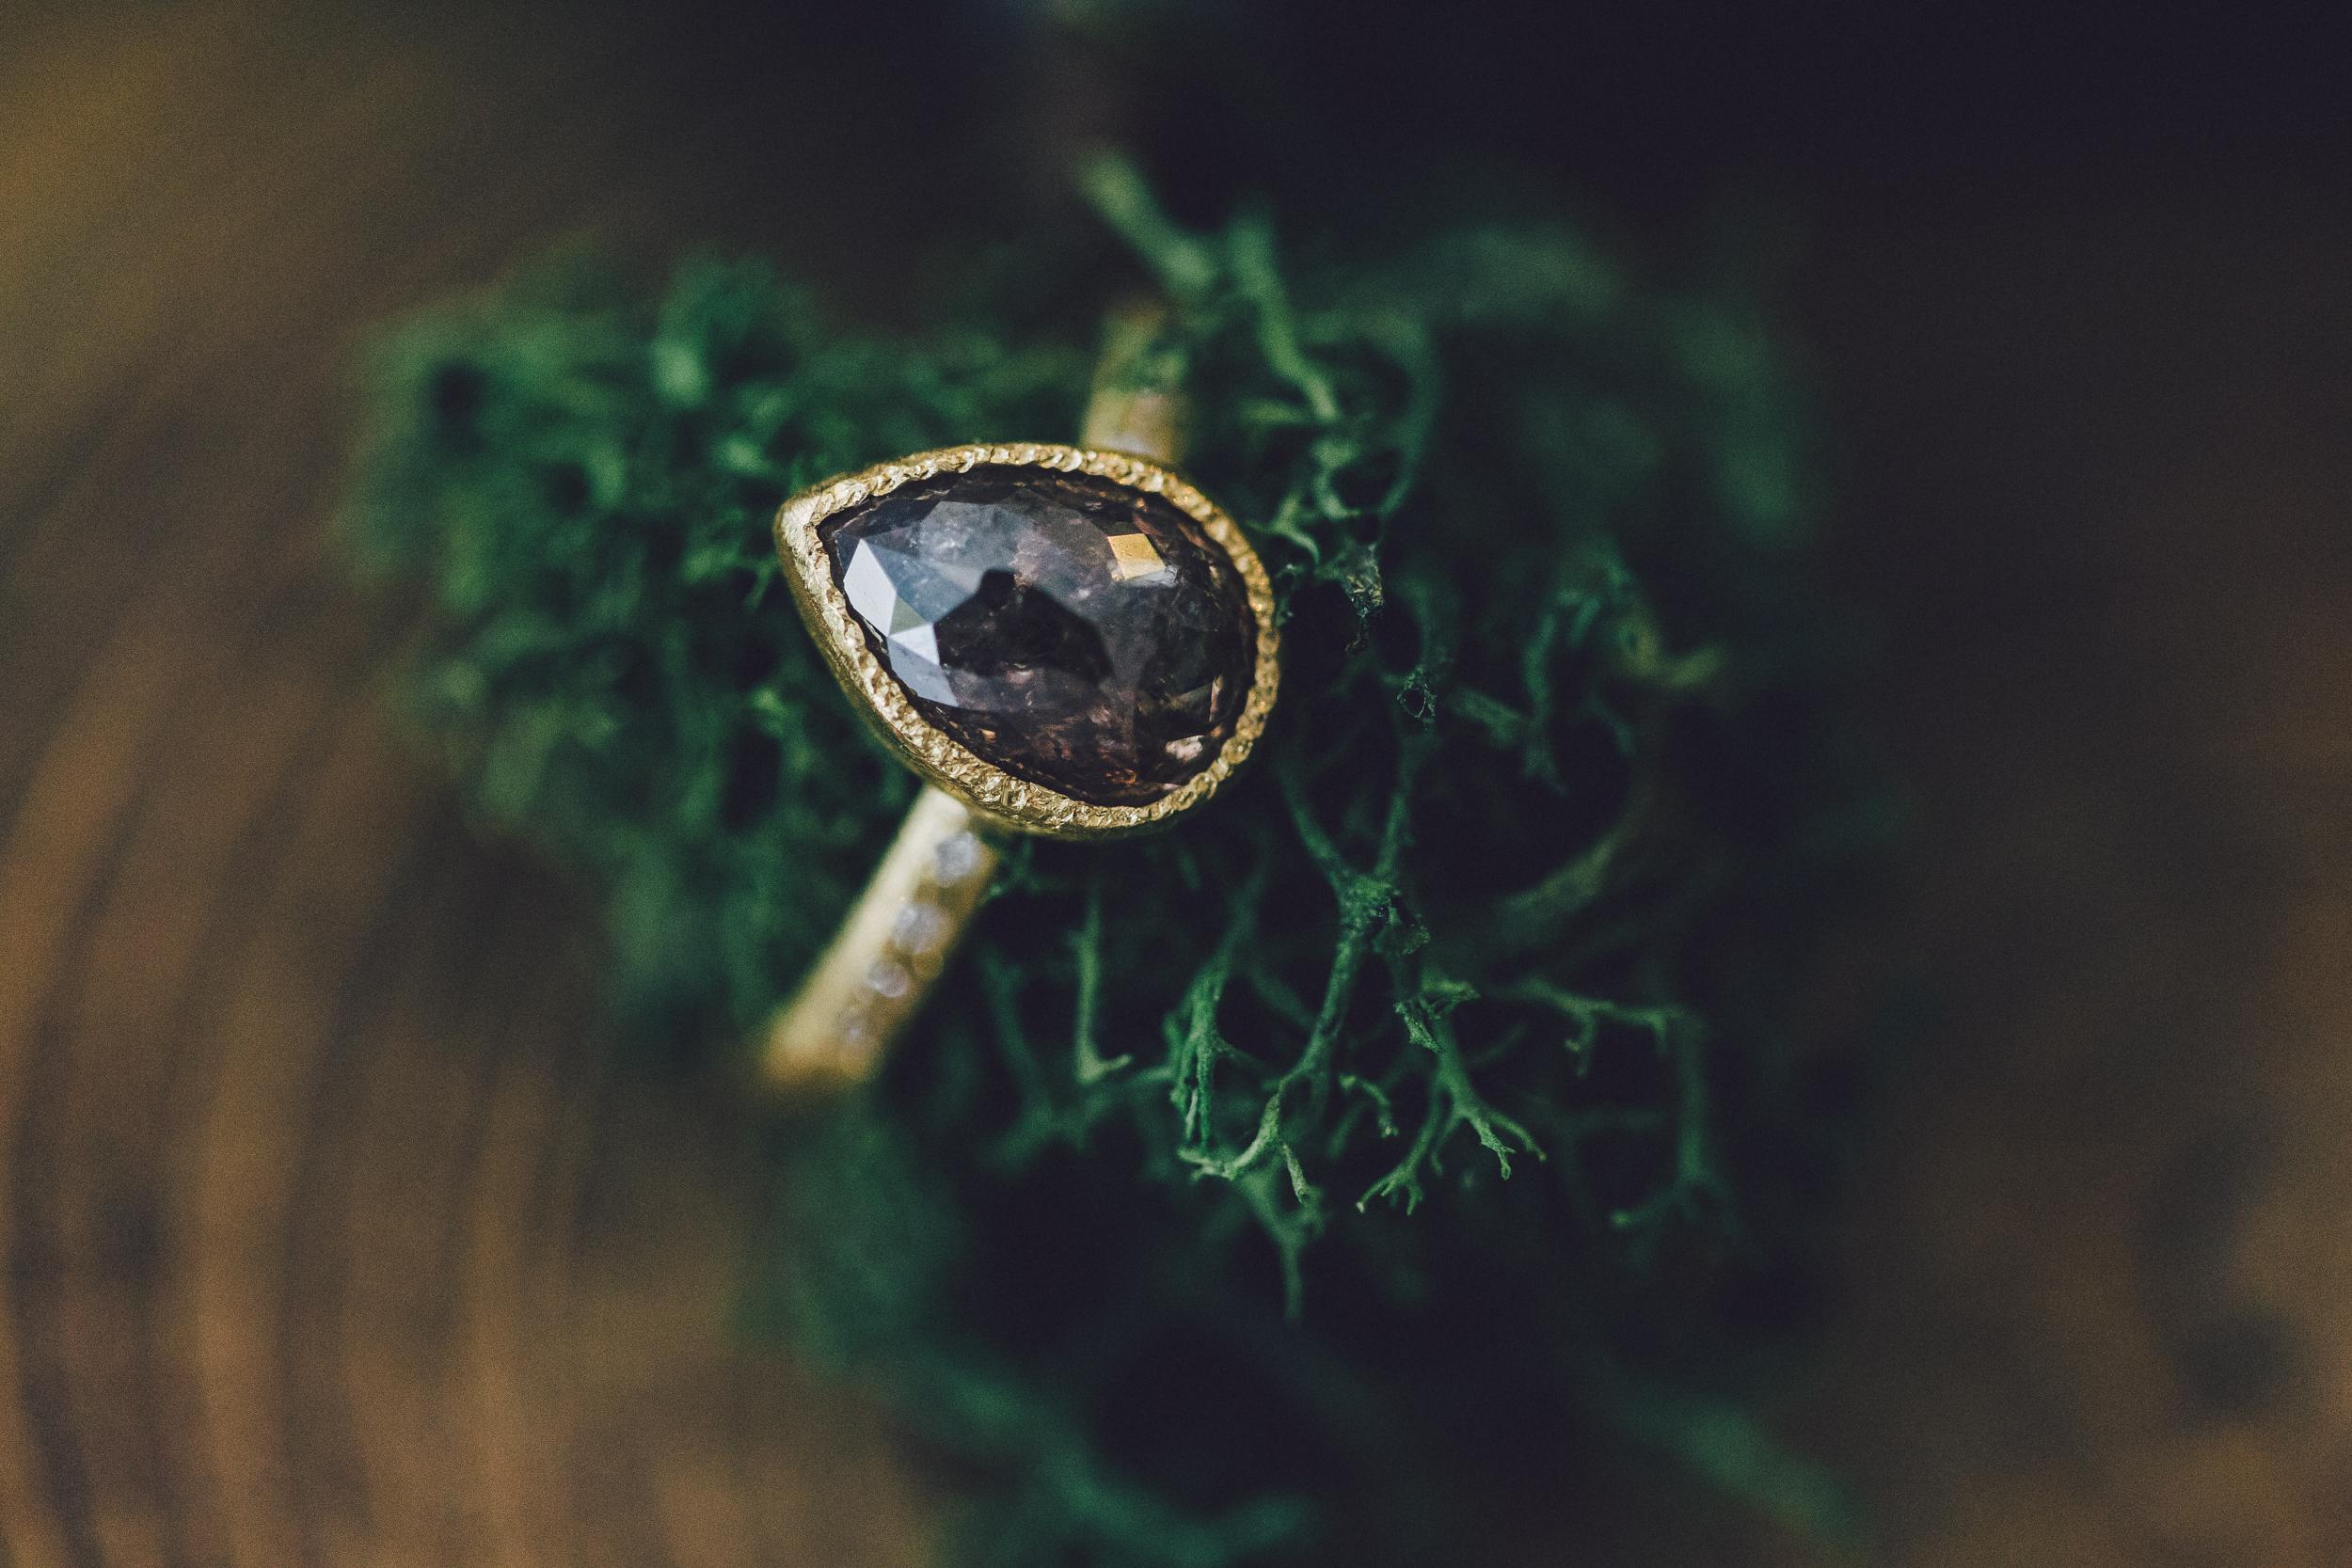 The Williamsburg Jeweler Marketing Natural Diamonds to Alt Brides